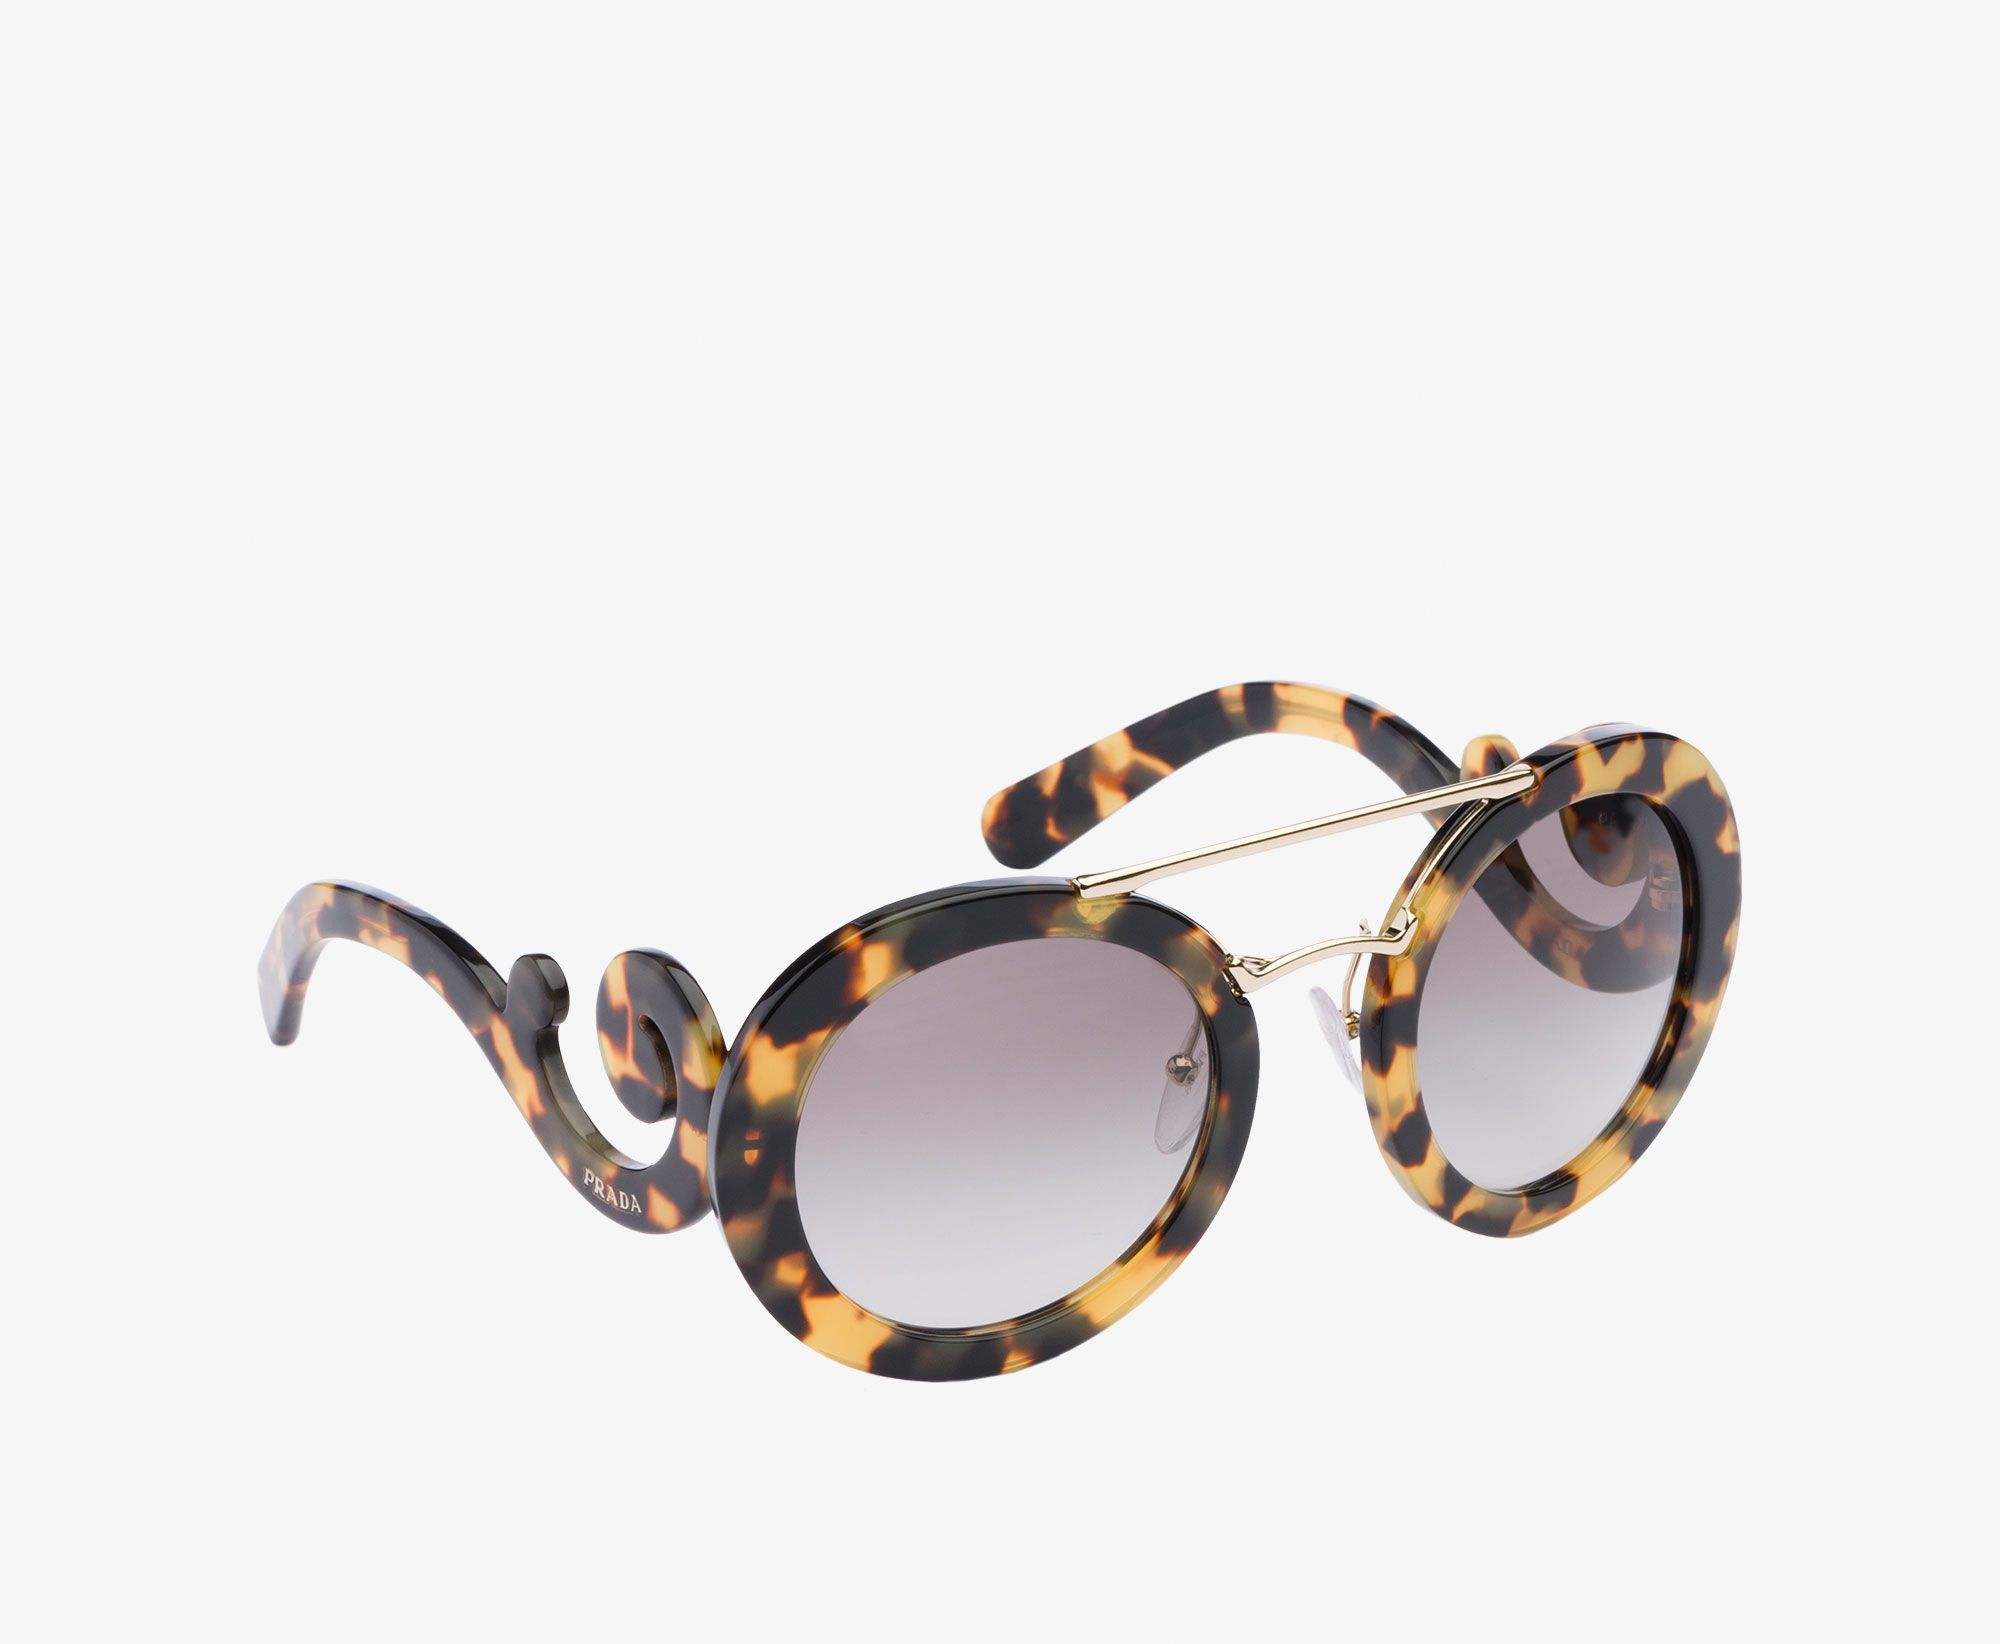 9d071e01eba1 Prada Woman - Eyewear - Dark grey gradient and lake blue lenses -  SPR13S_E7S0_F00A7